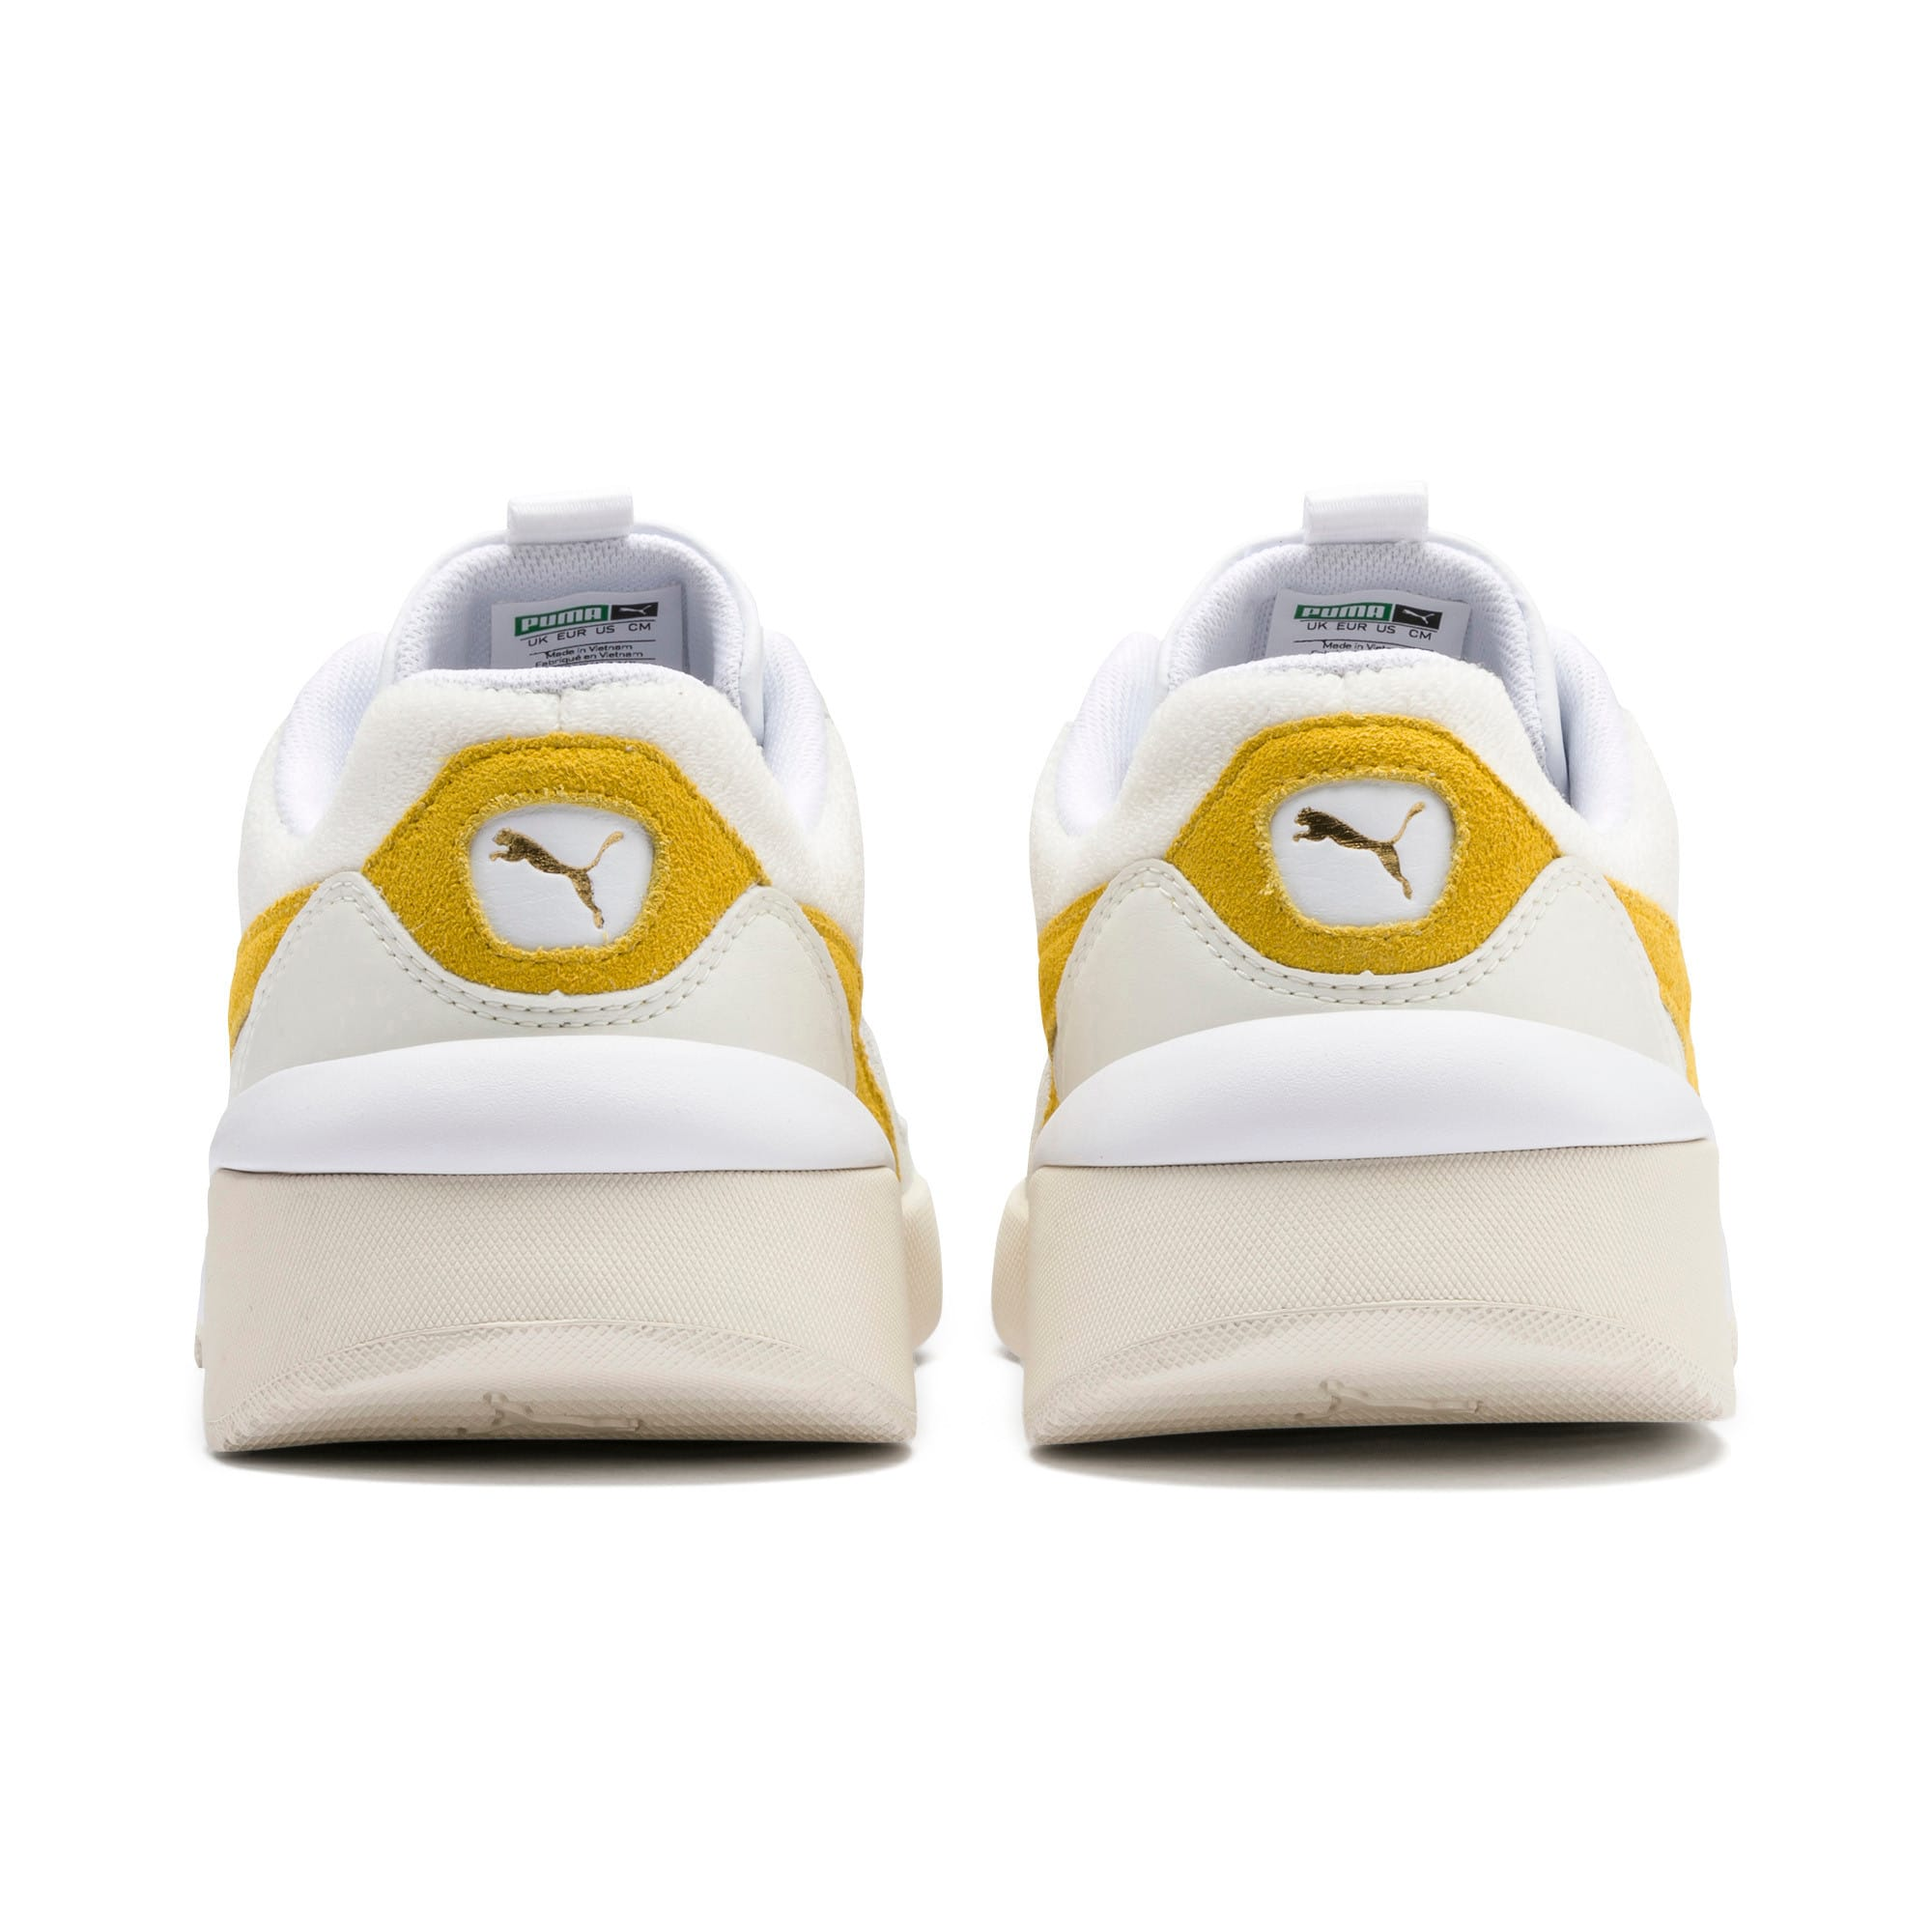 Thumbnail 4 of Aeon Heritage Women's Sneakers, Puma White-Sulphur, medium